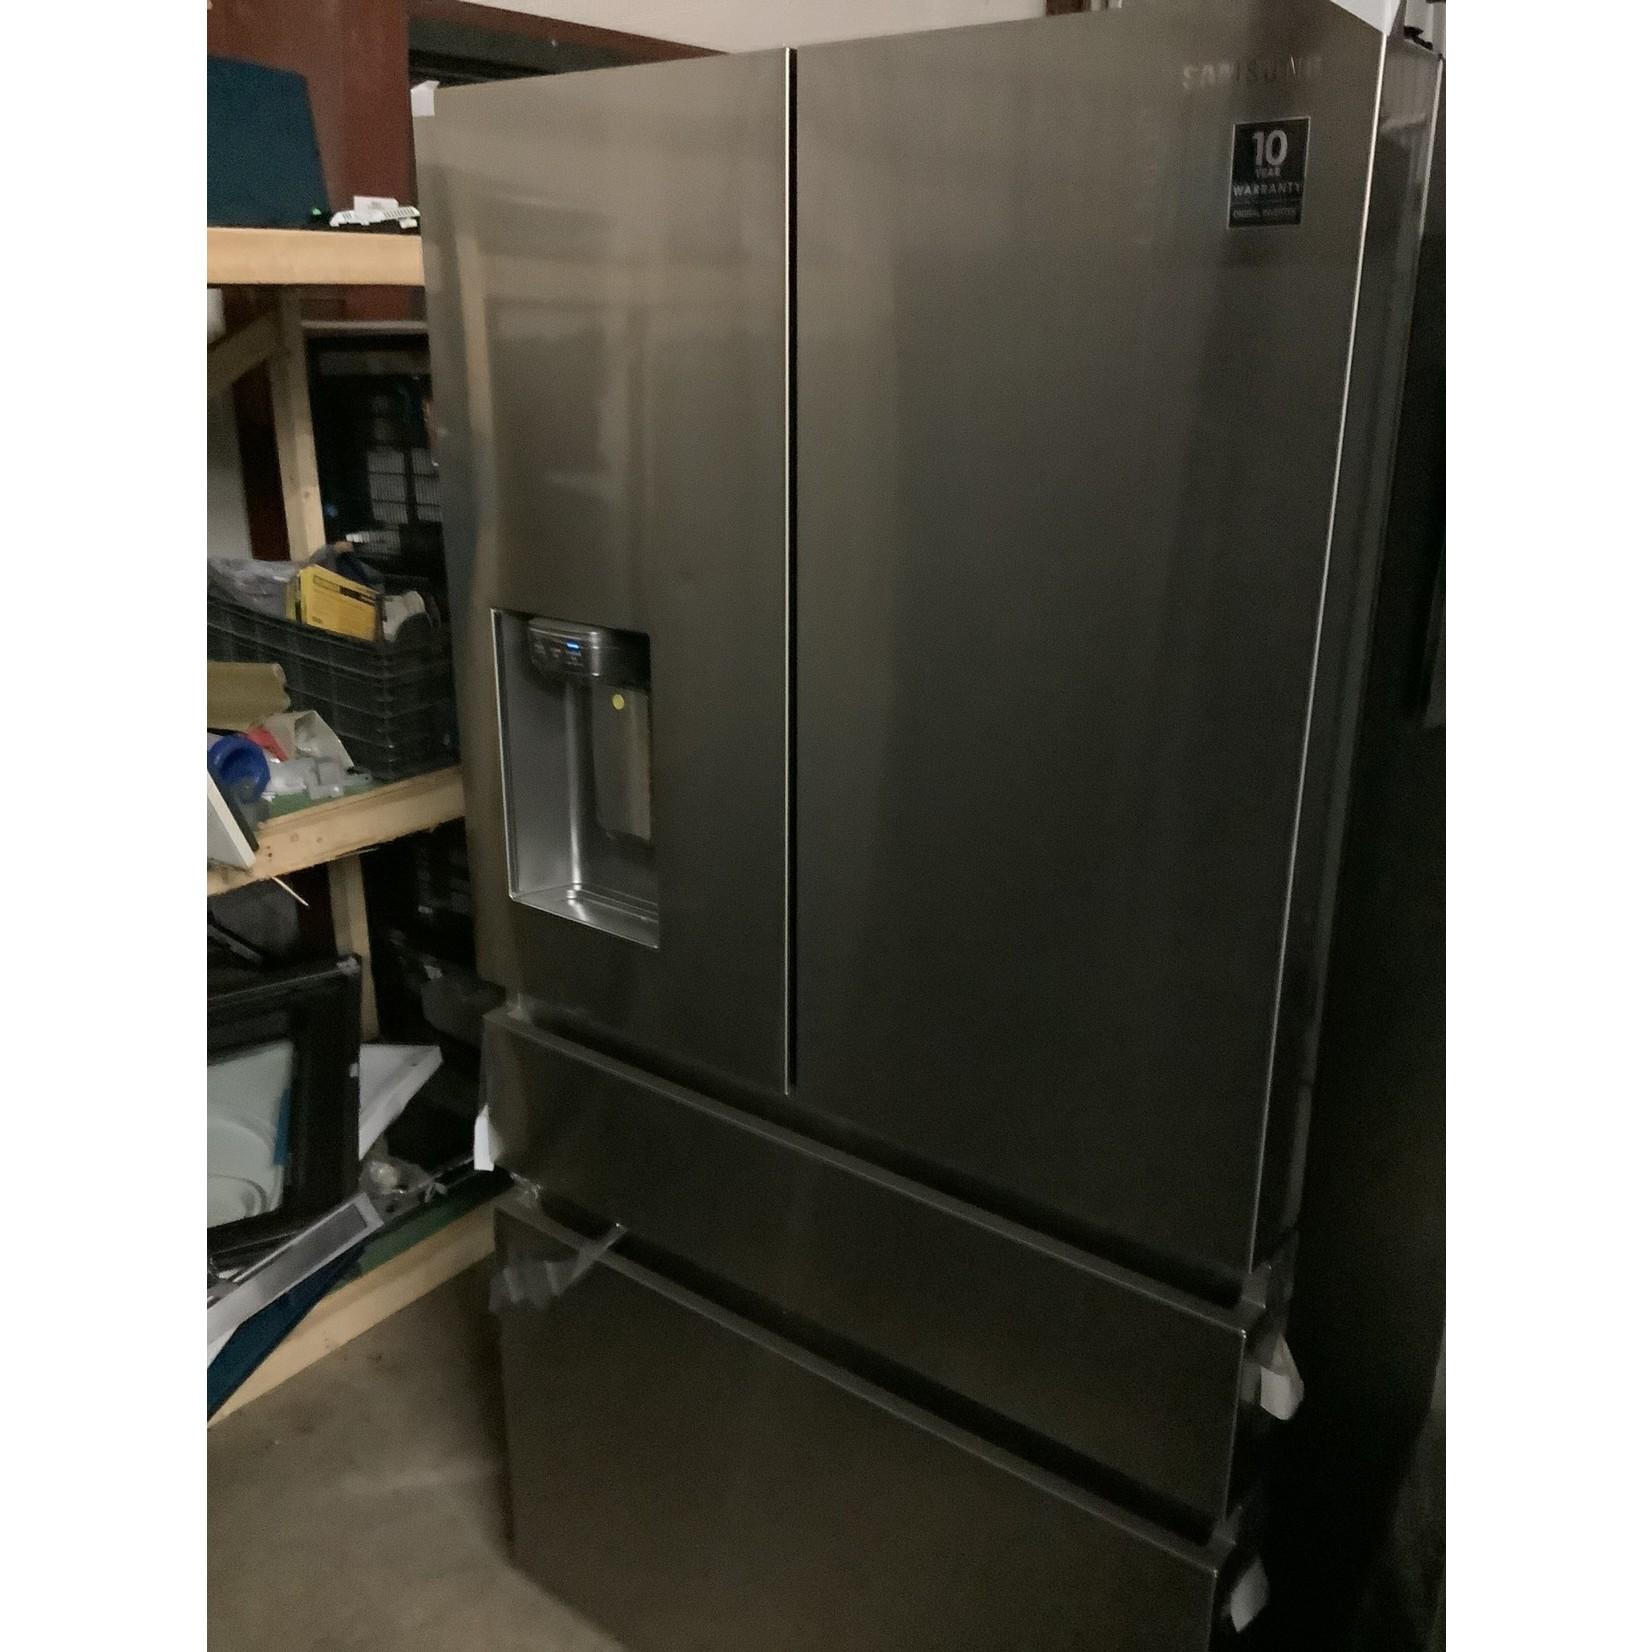 Samsung Samsung 4 door refrigerator